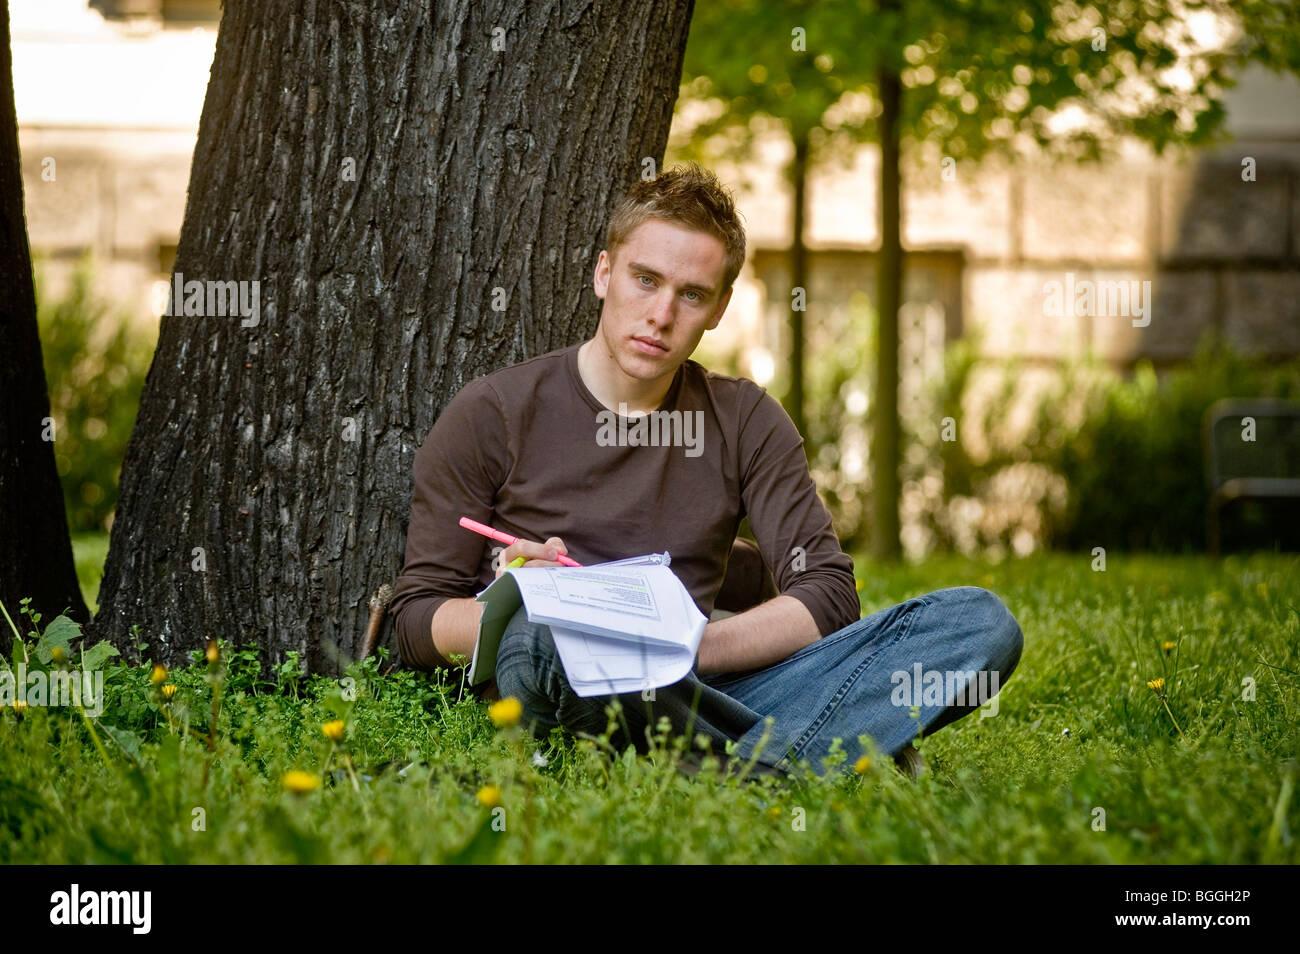 Estudiante de la Universidad Europea Viadrina, Frankfurt/Oder, Brandenburgo, Alemania, Europa Imagen De Stock